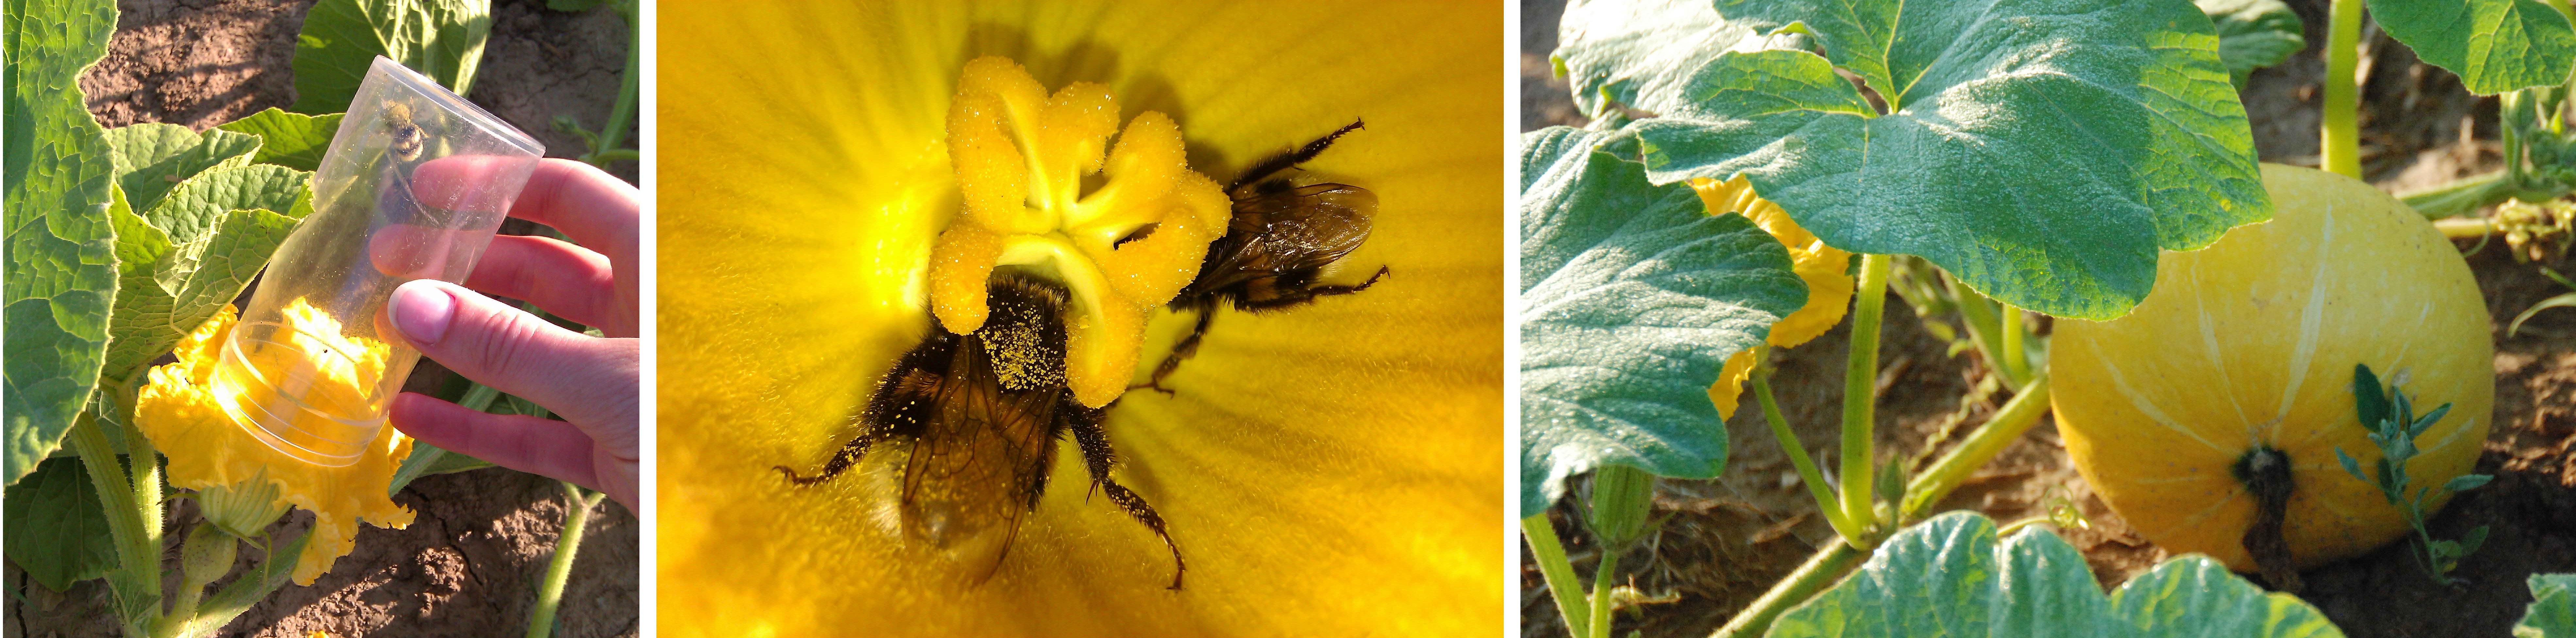 kuerbis_pollination